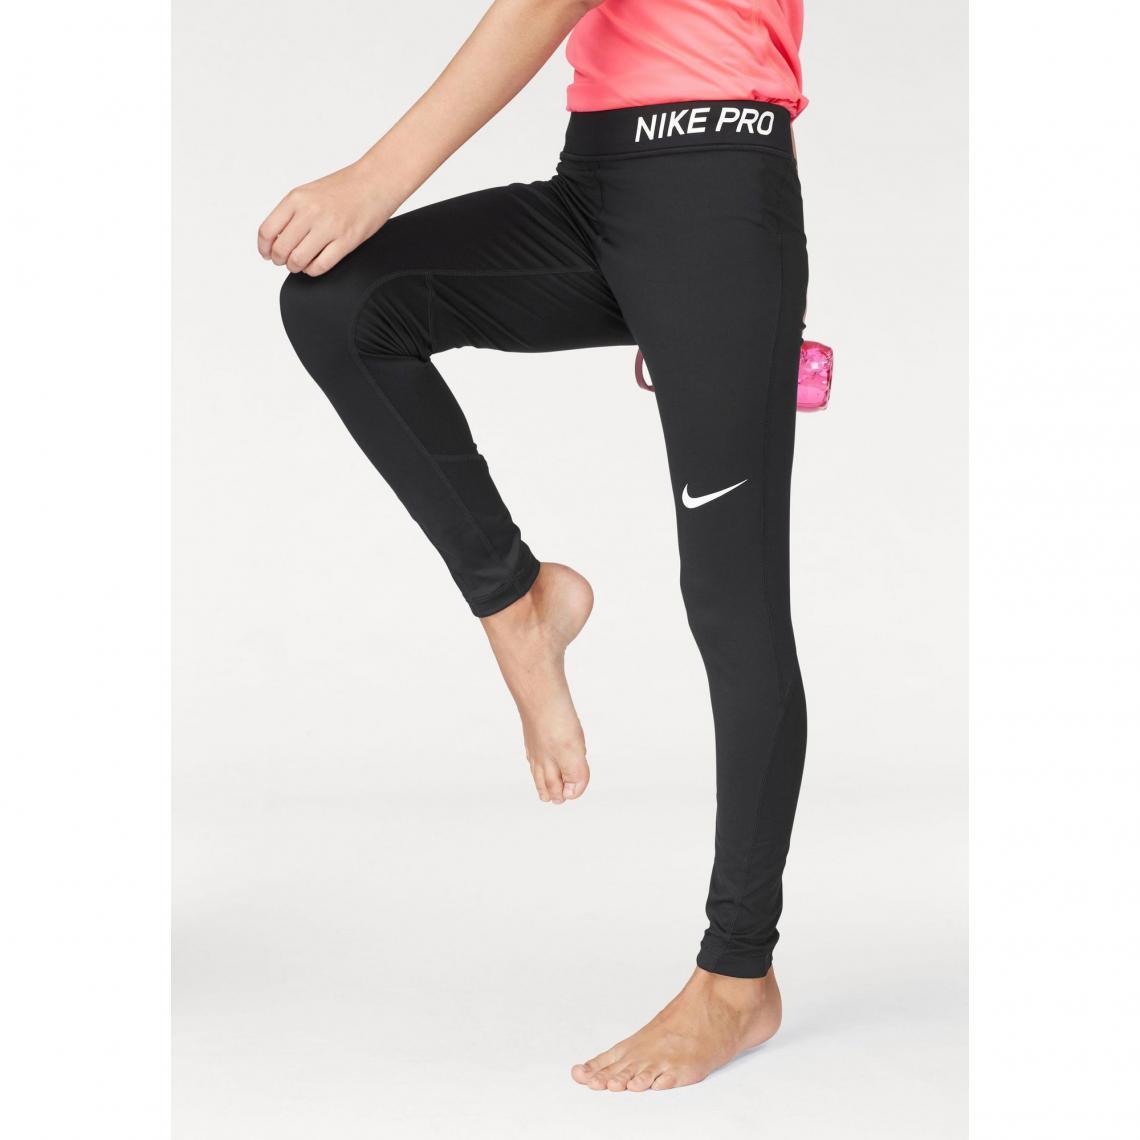 Collant de training femme Nike Pro - Noir Nike Enfant 5e9bf39fe13